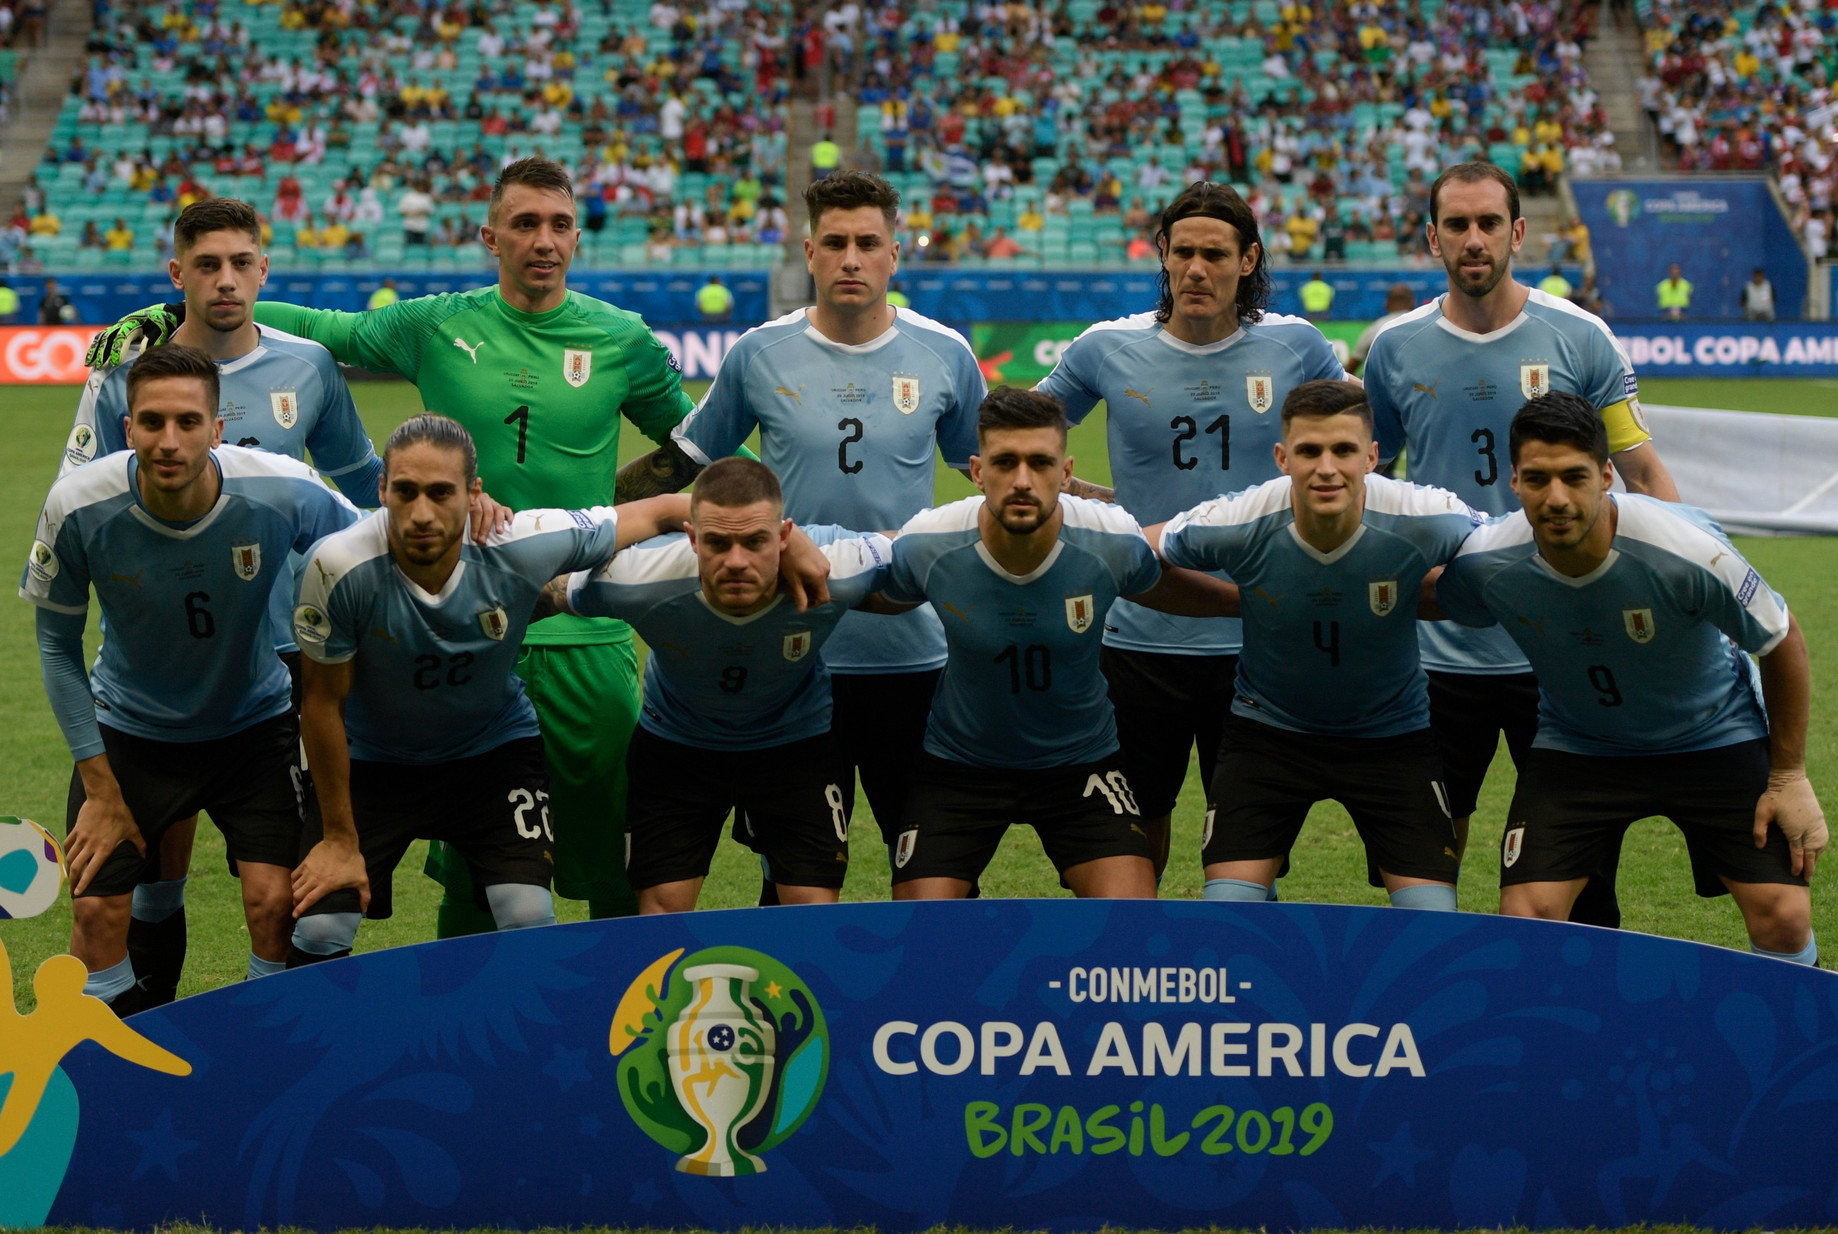 5) Uruguay